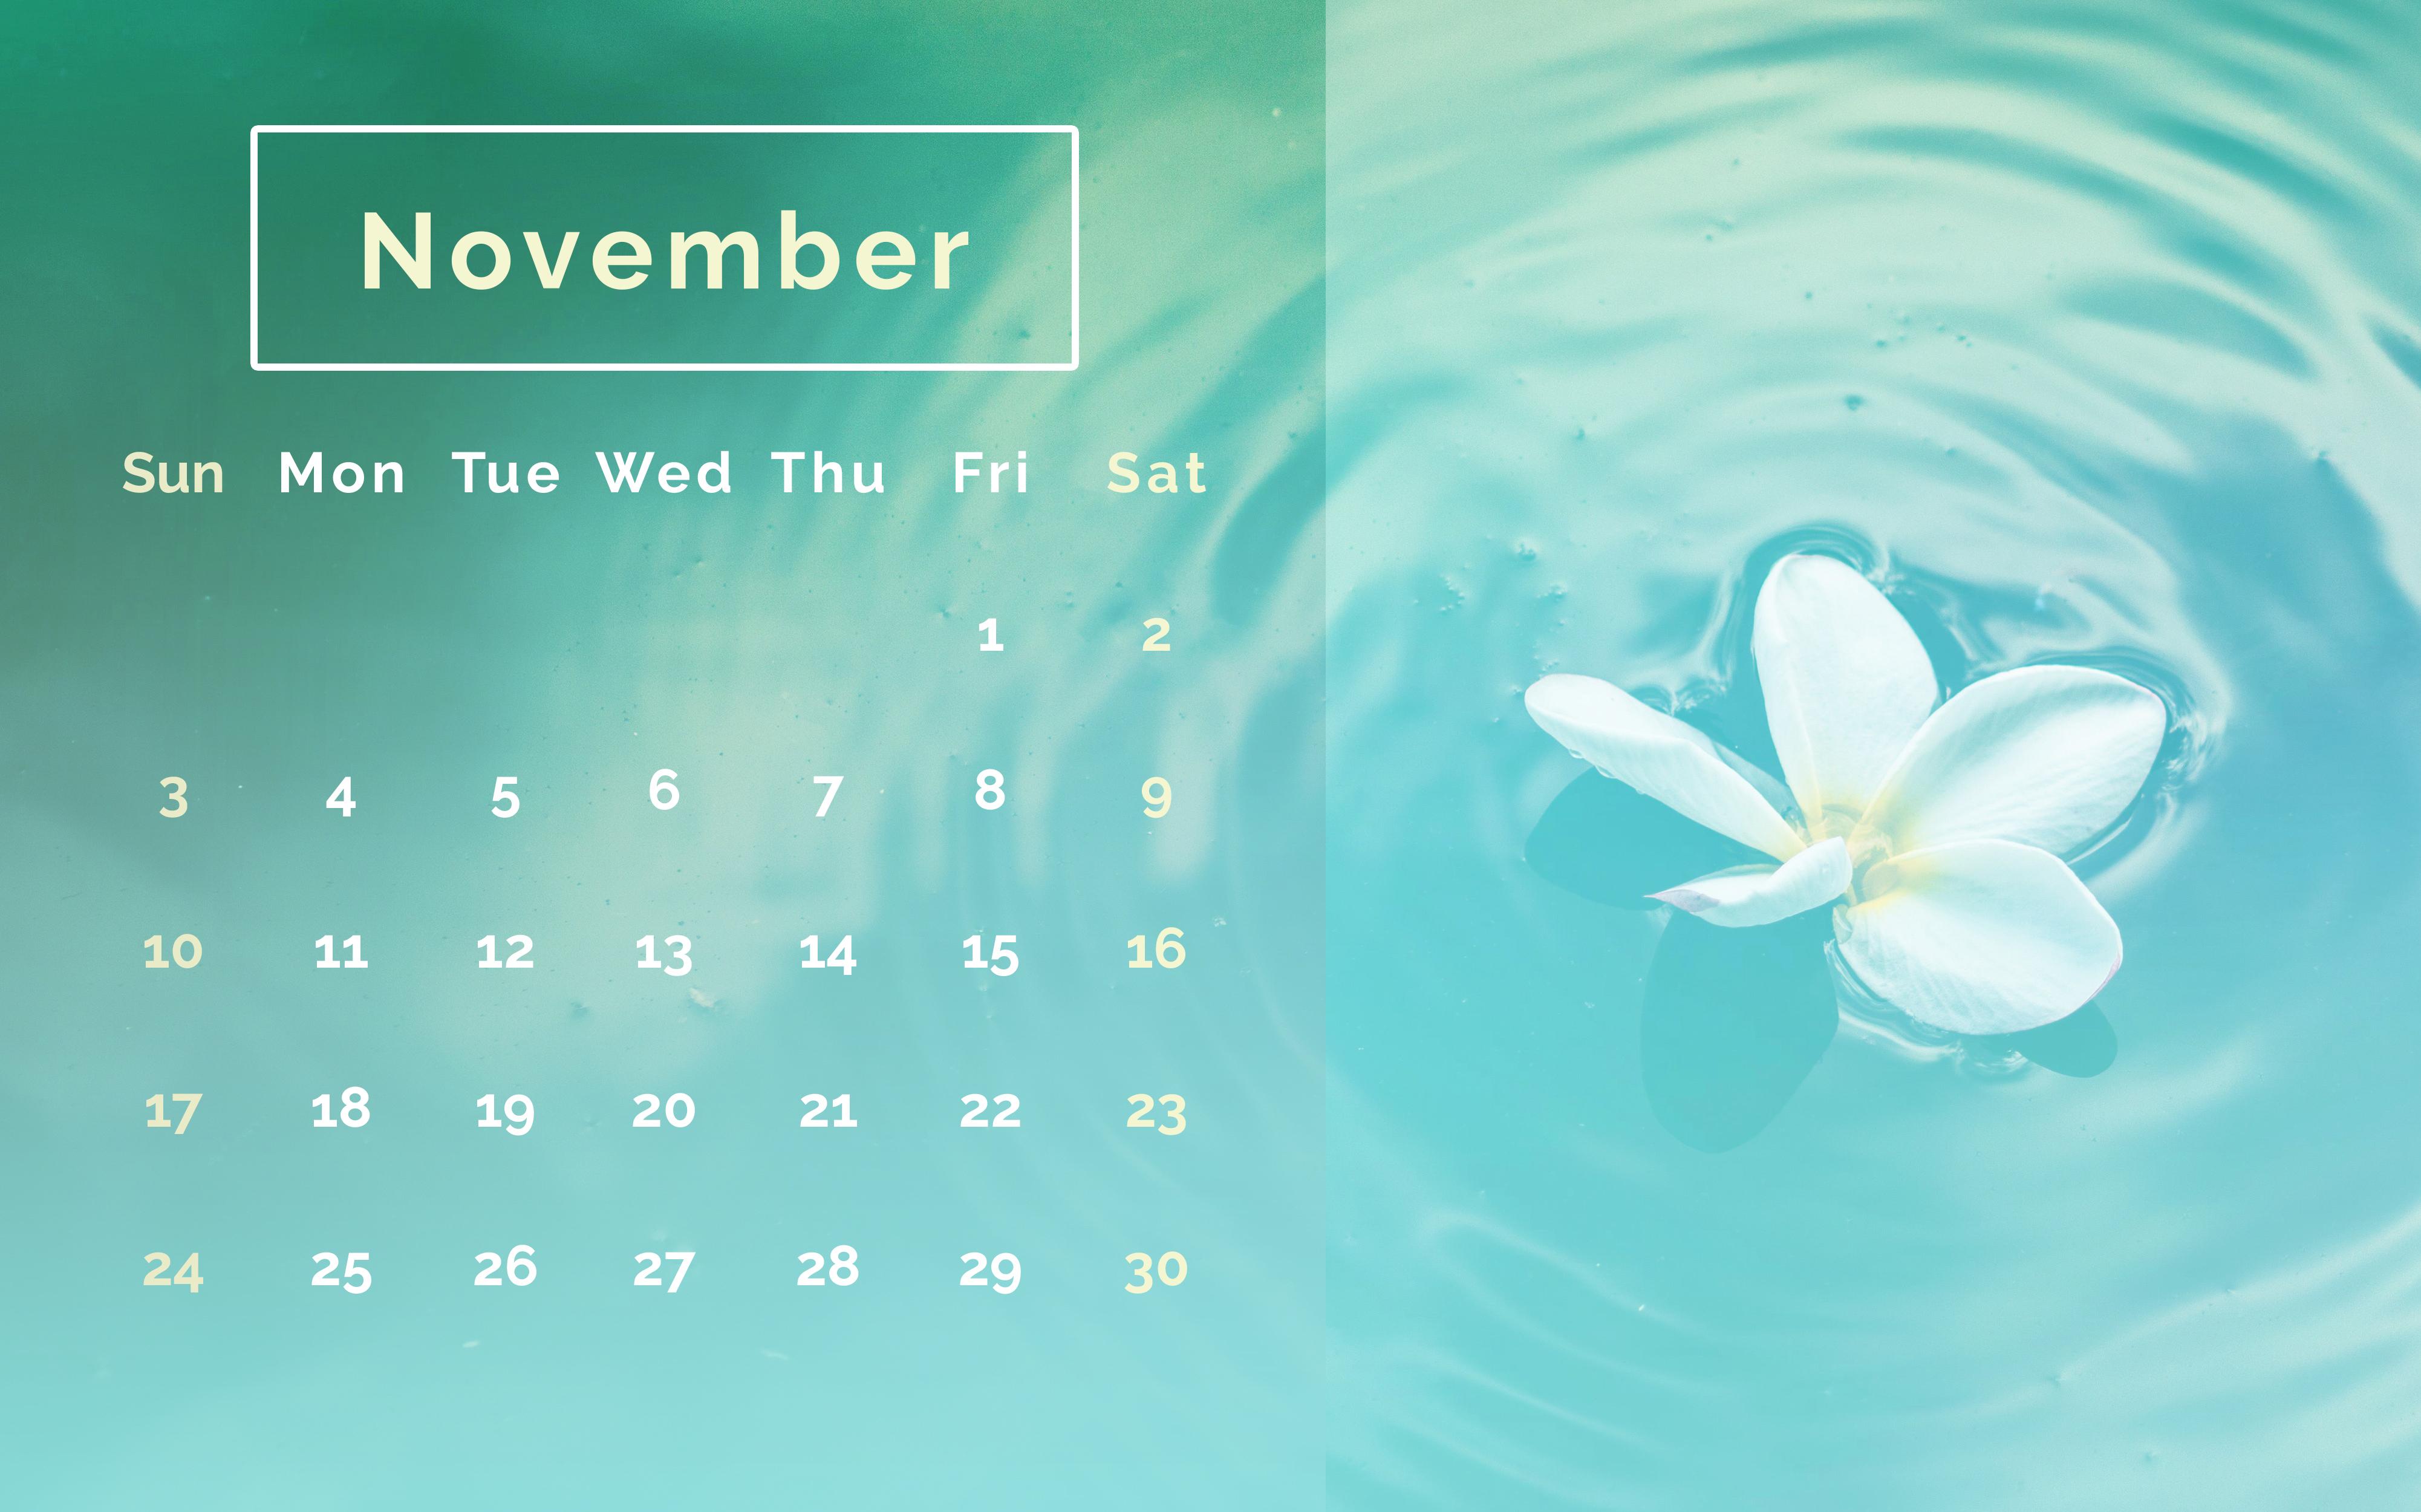 Floral November 2019 Calendar Wallpaper